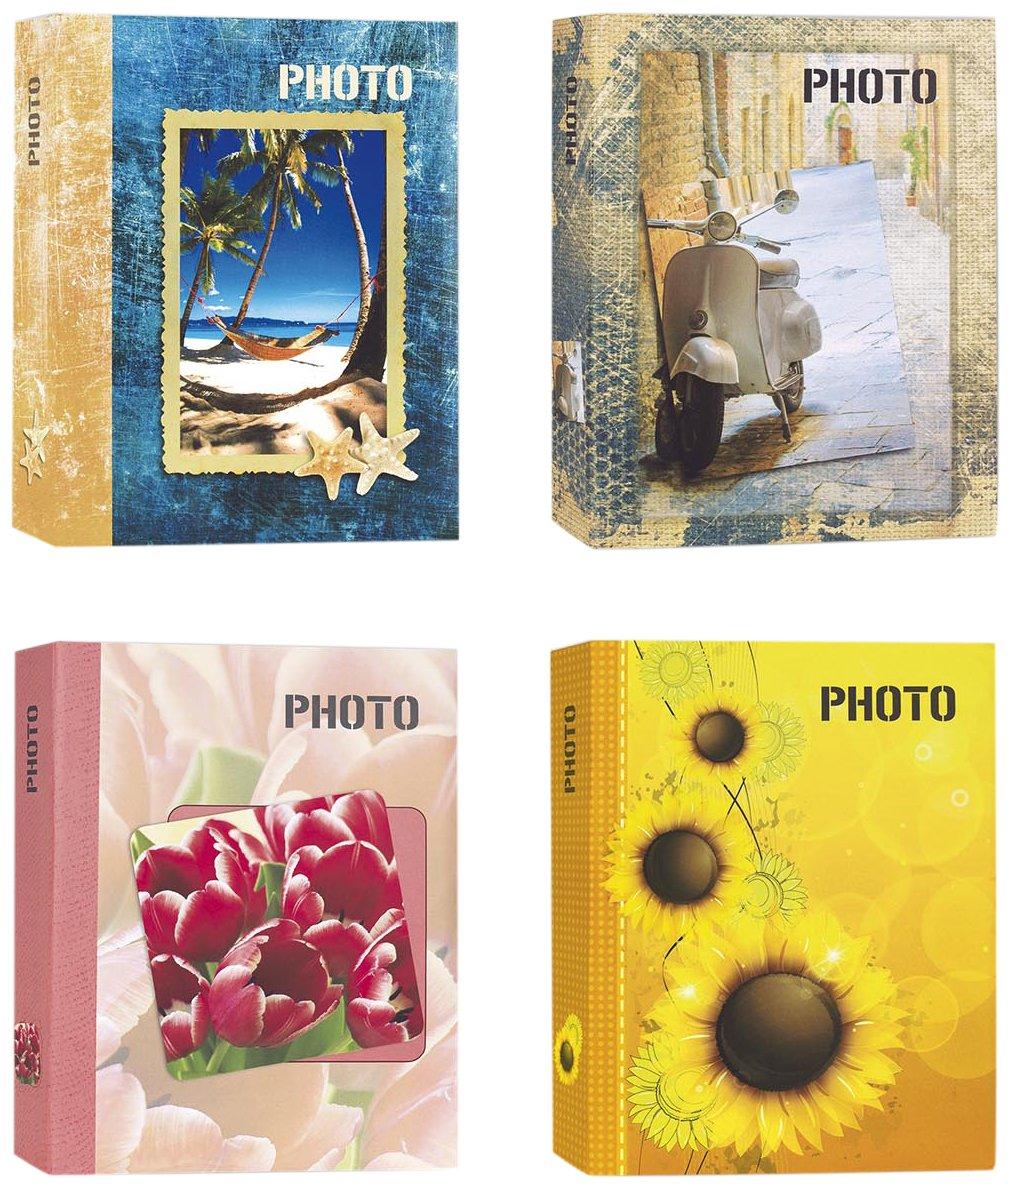 Zep Slip-In - Album da 300 foto, Modelli assortiti, 13x 19cm, 1 pezzo 1 pezzo PH57300